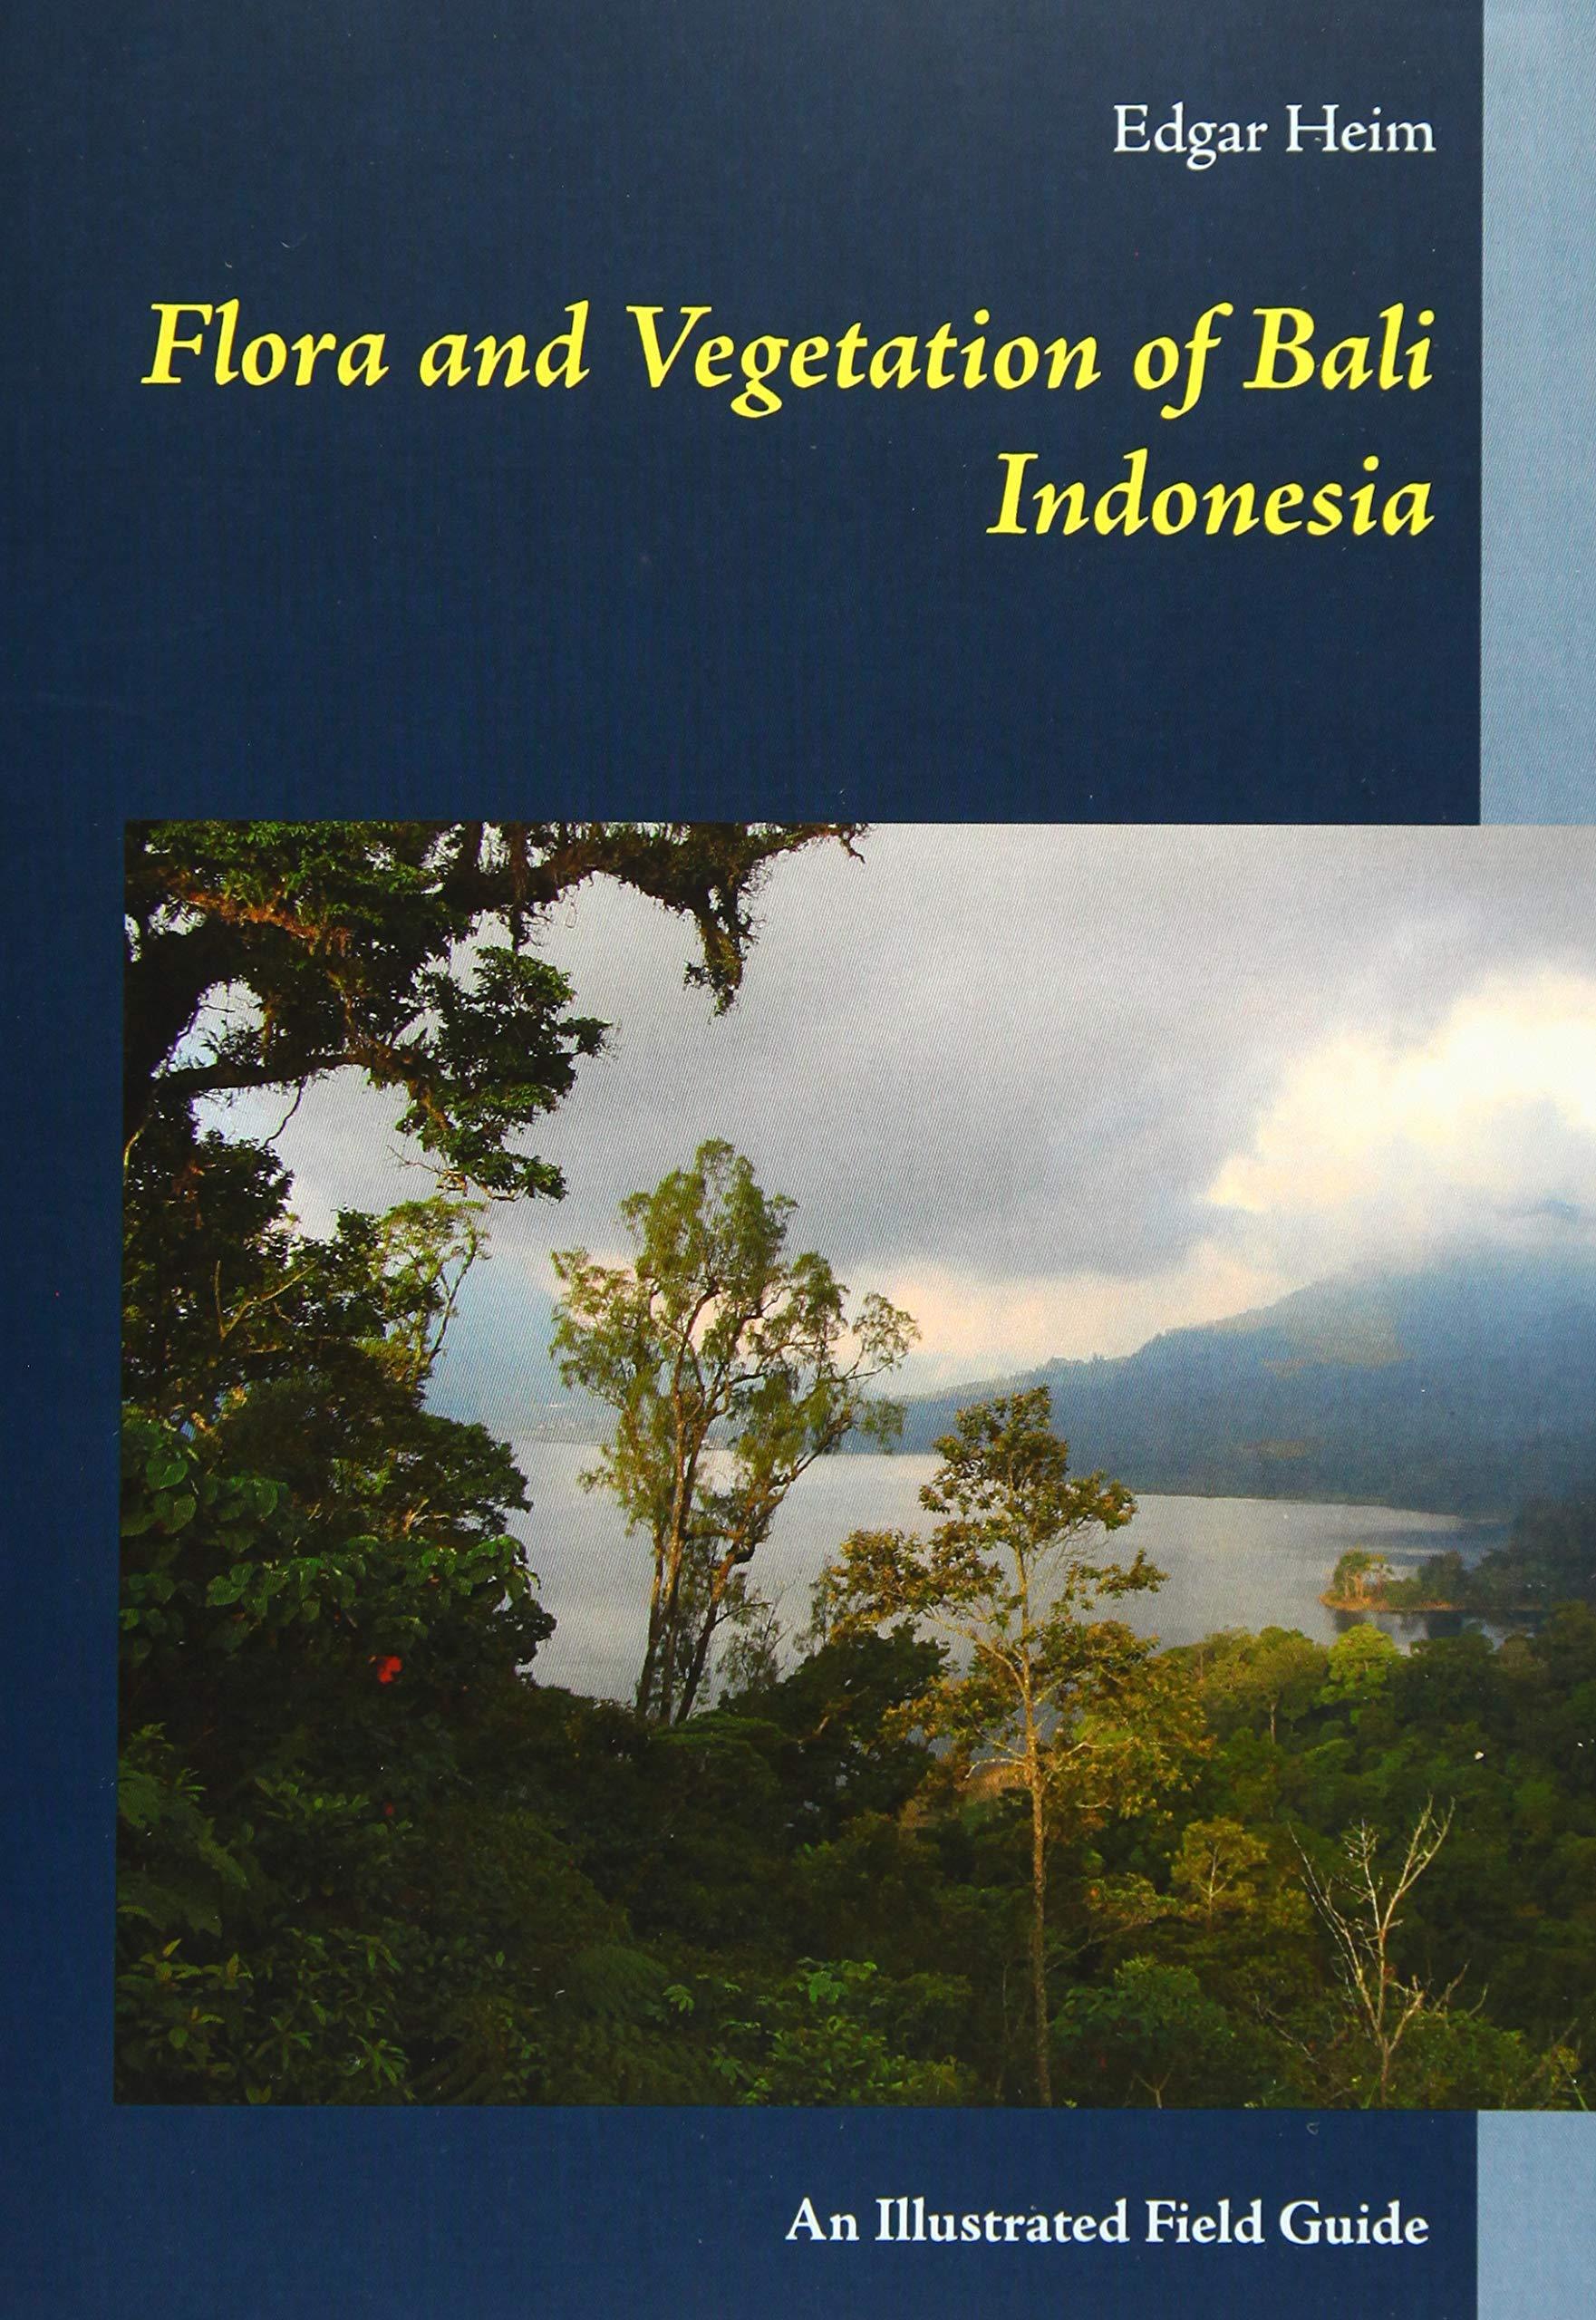 Flora and Vegetation of Bali Indonesia: Edgar Heim